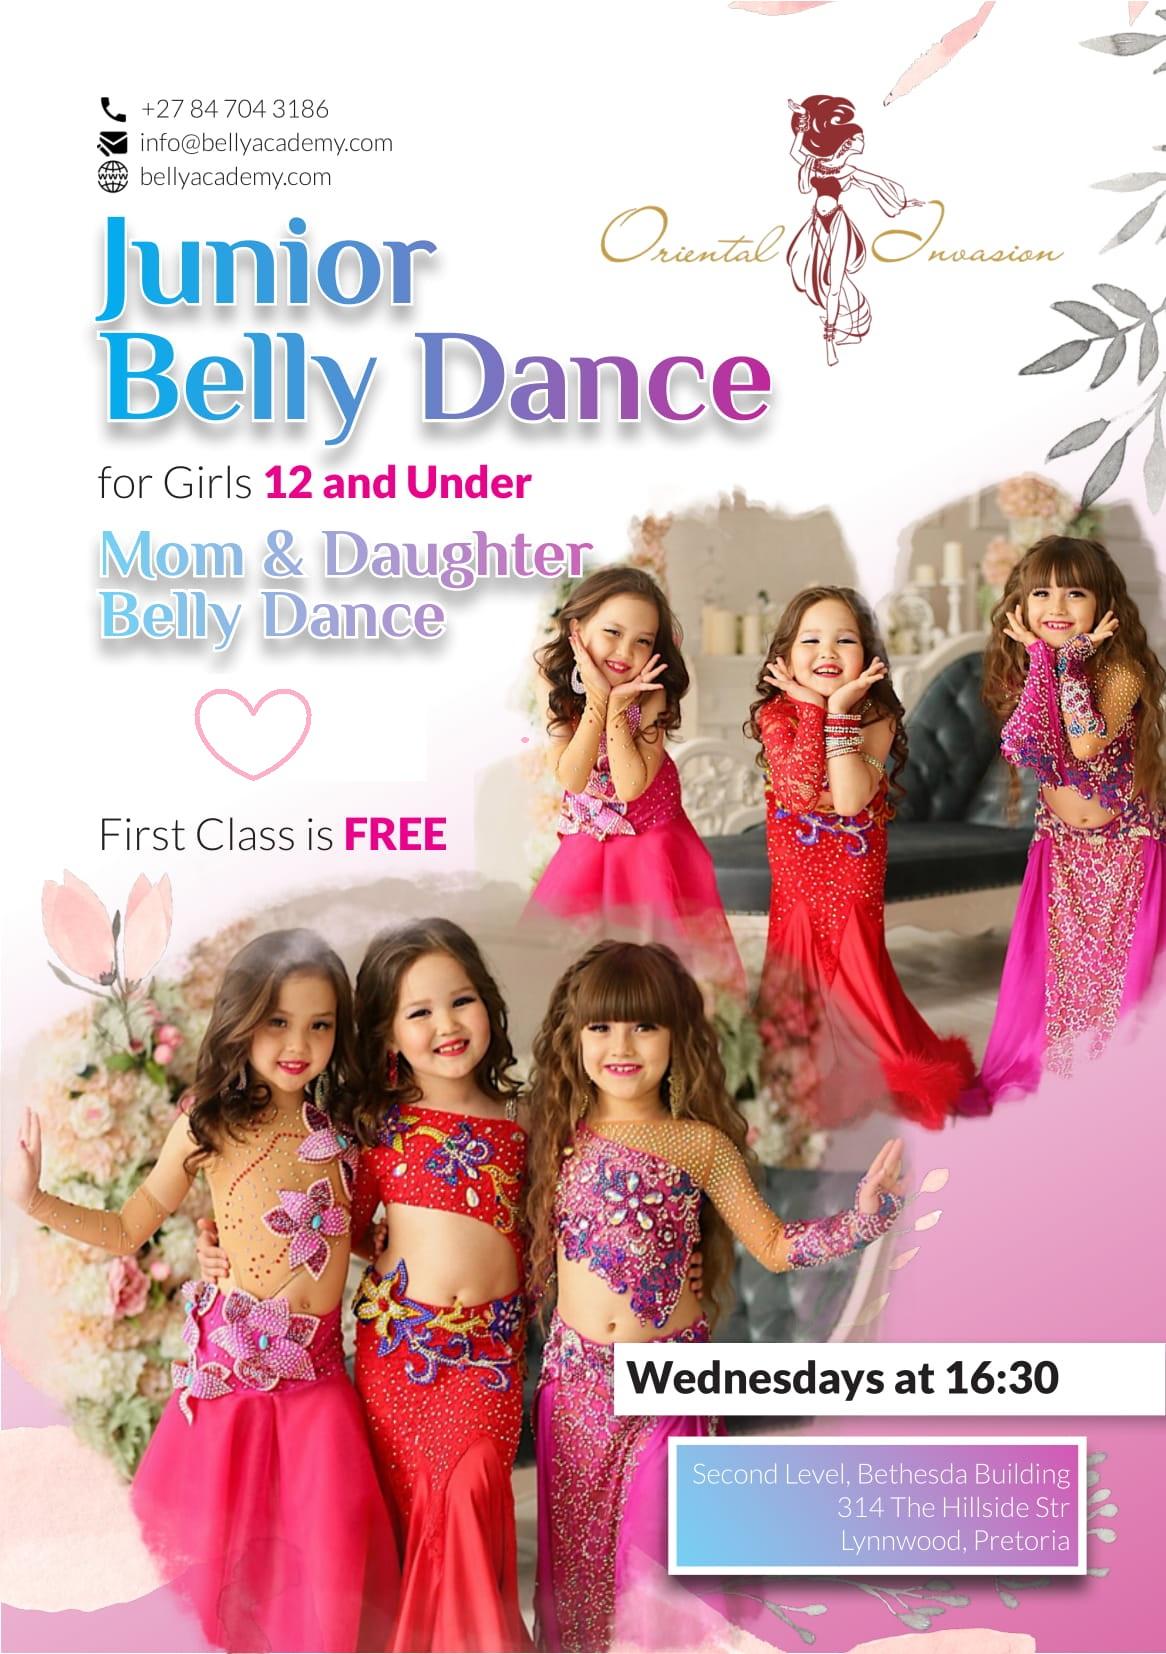 Junior Belly Dance Classes